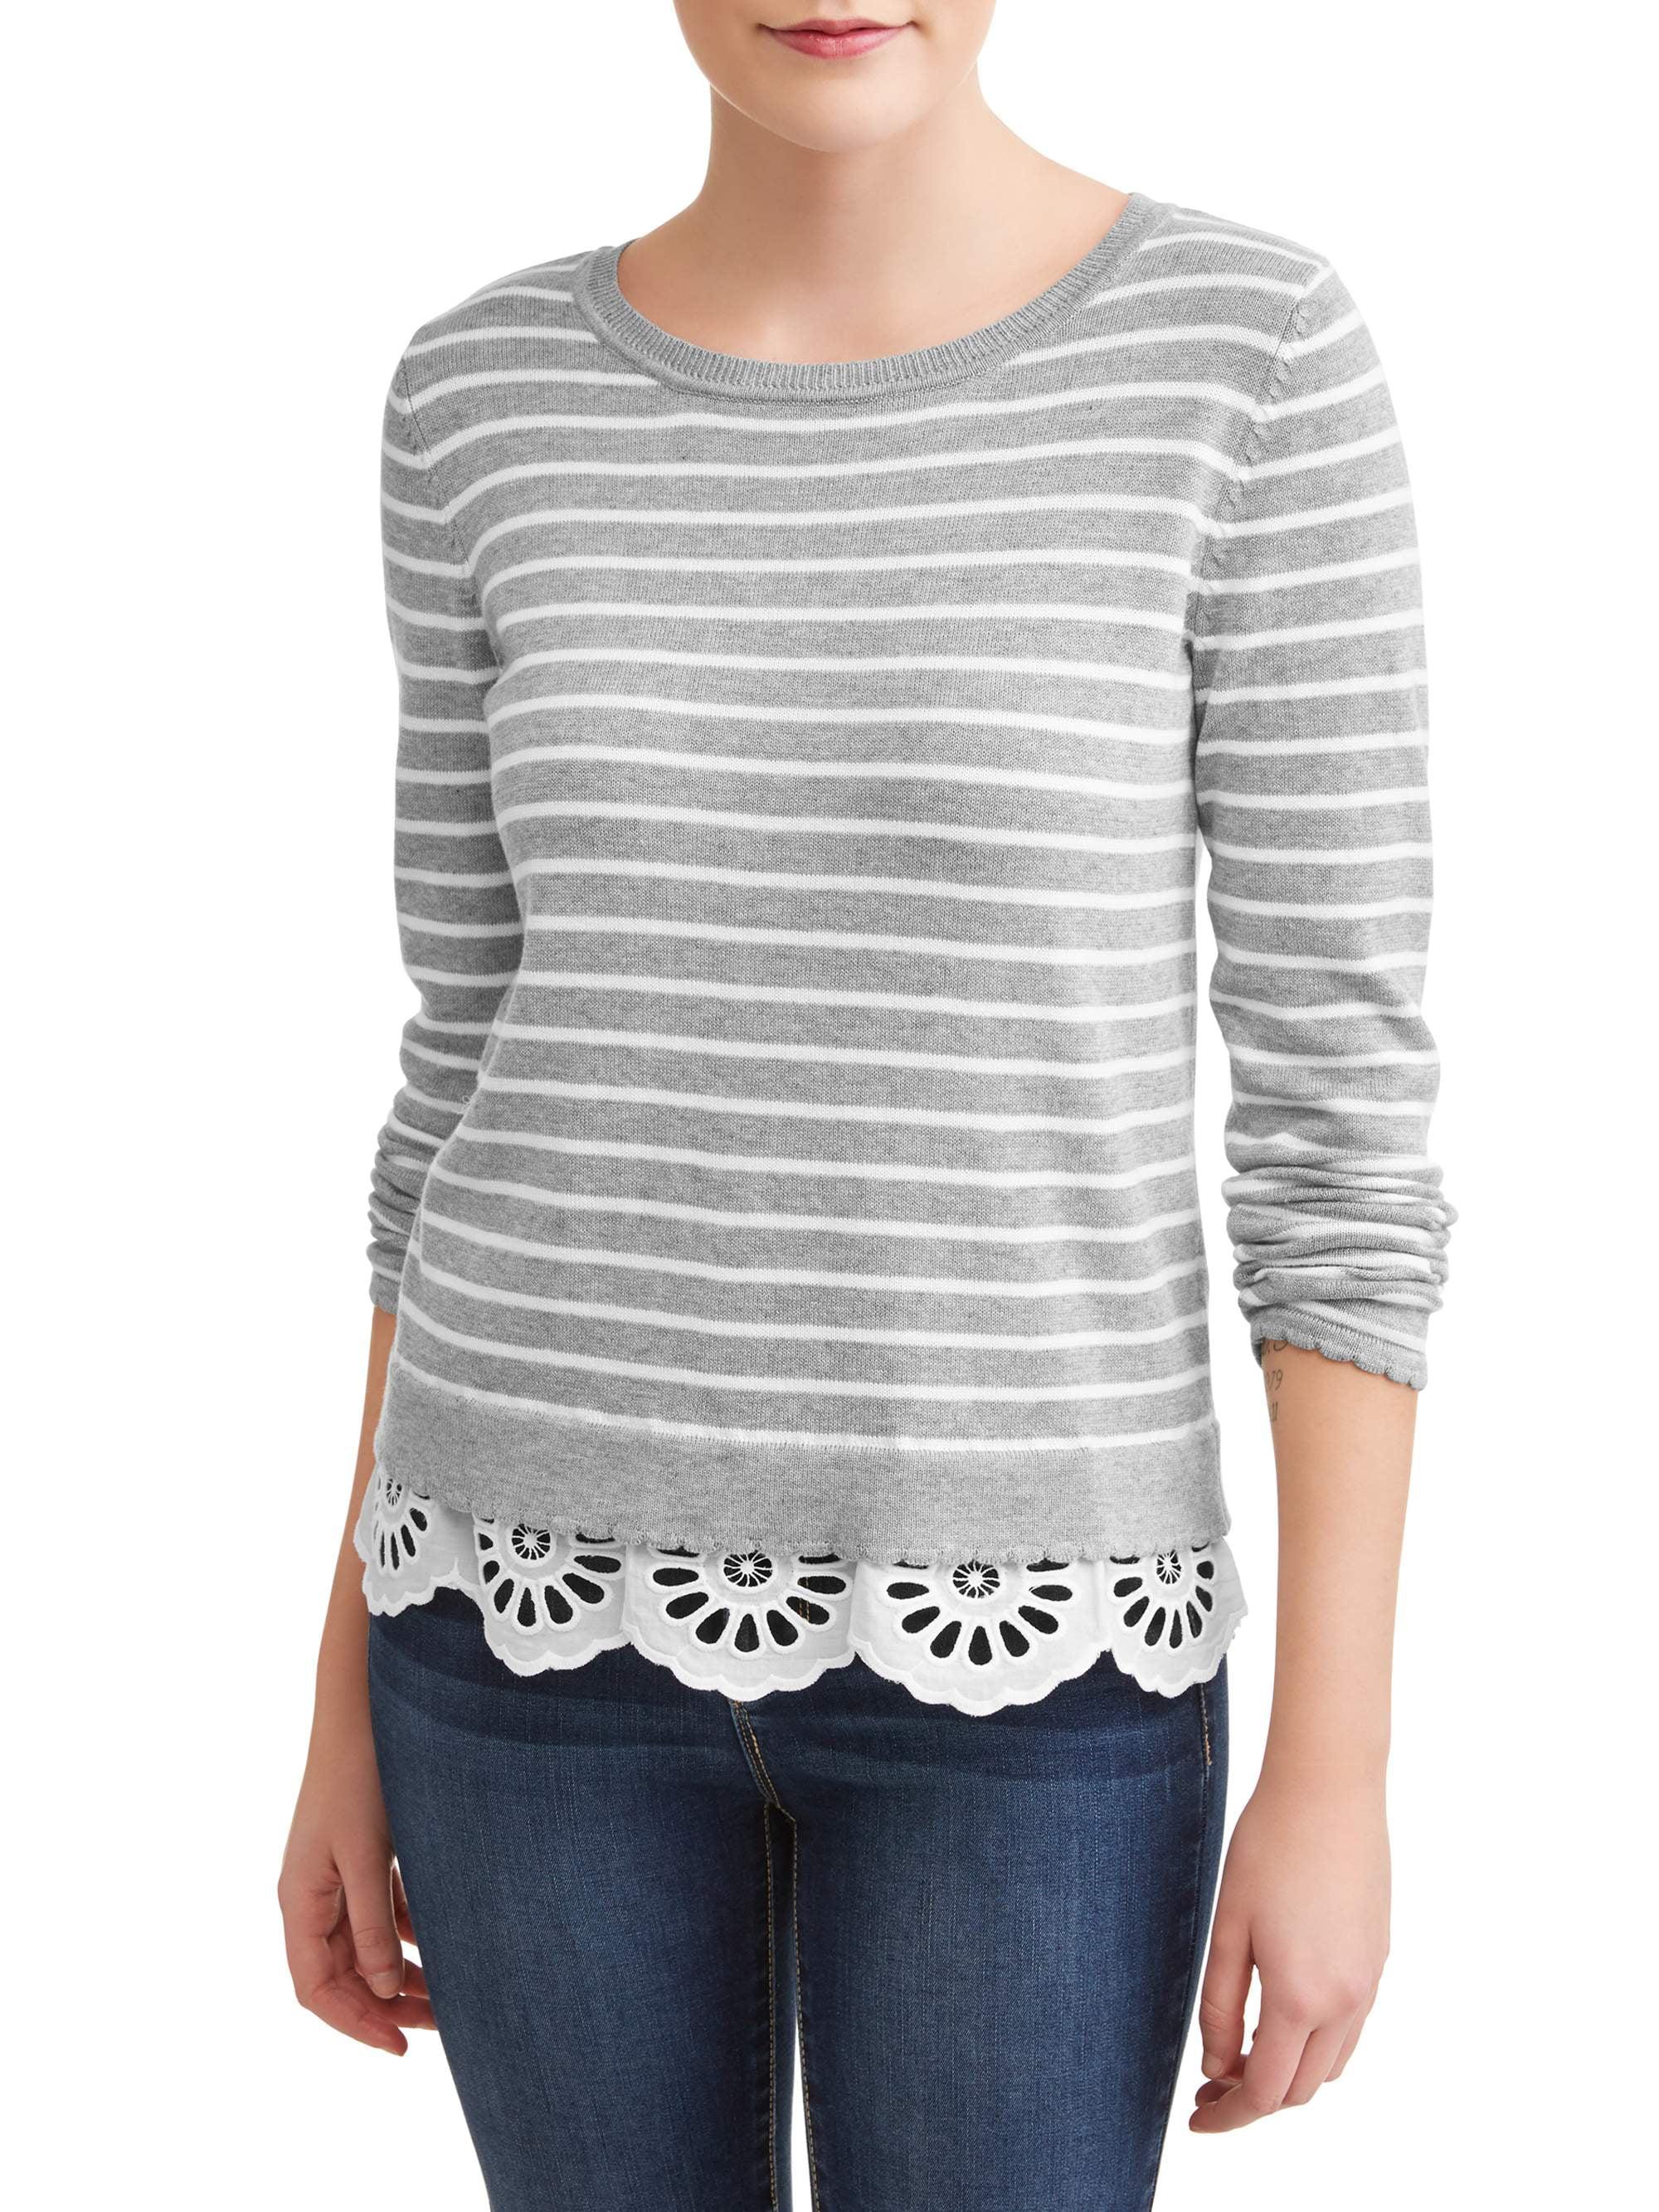 Women's Striped Lace Trim Sweater